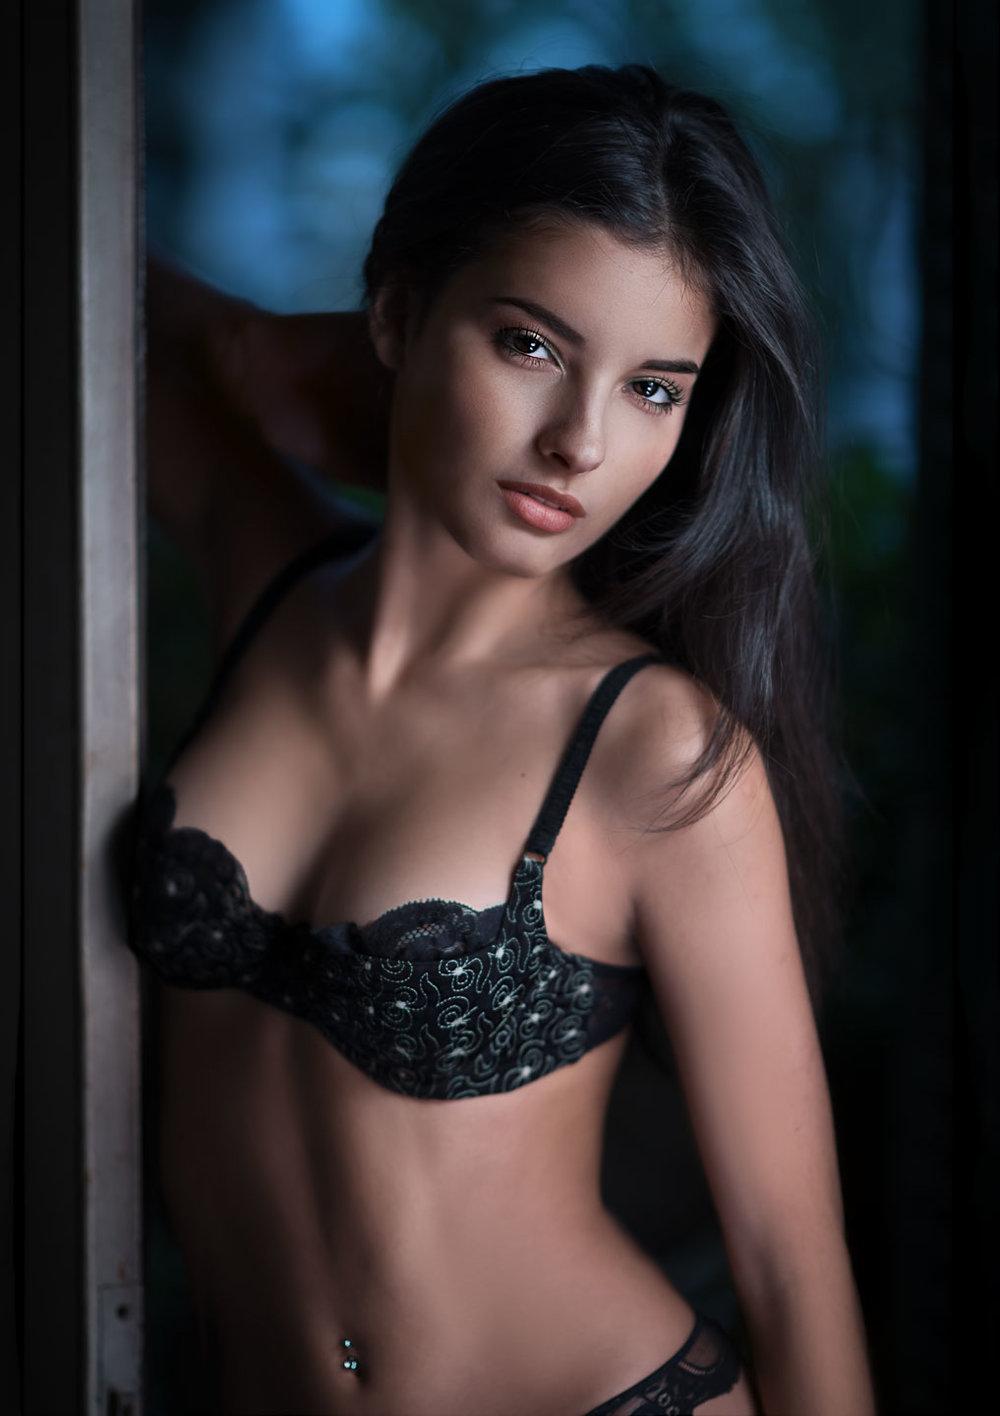 Cami-Panties-101-Edit.jpg